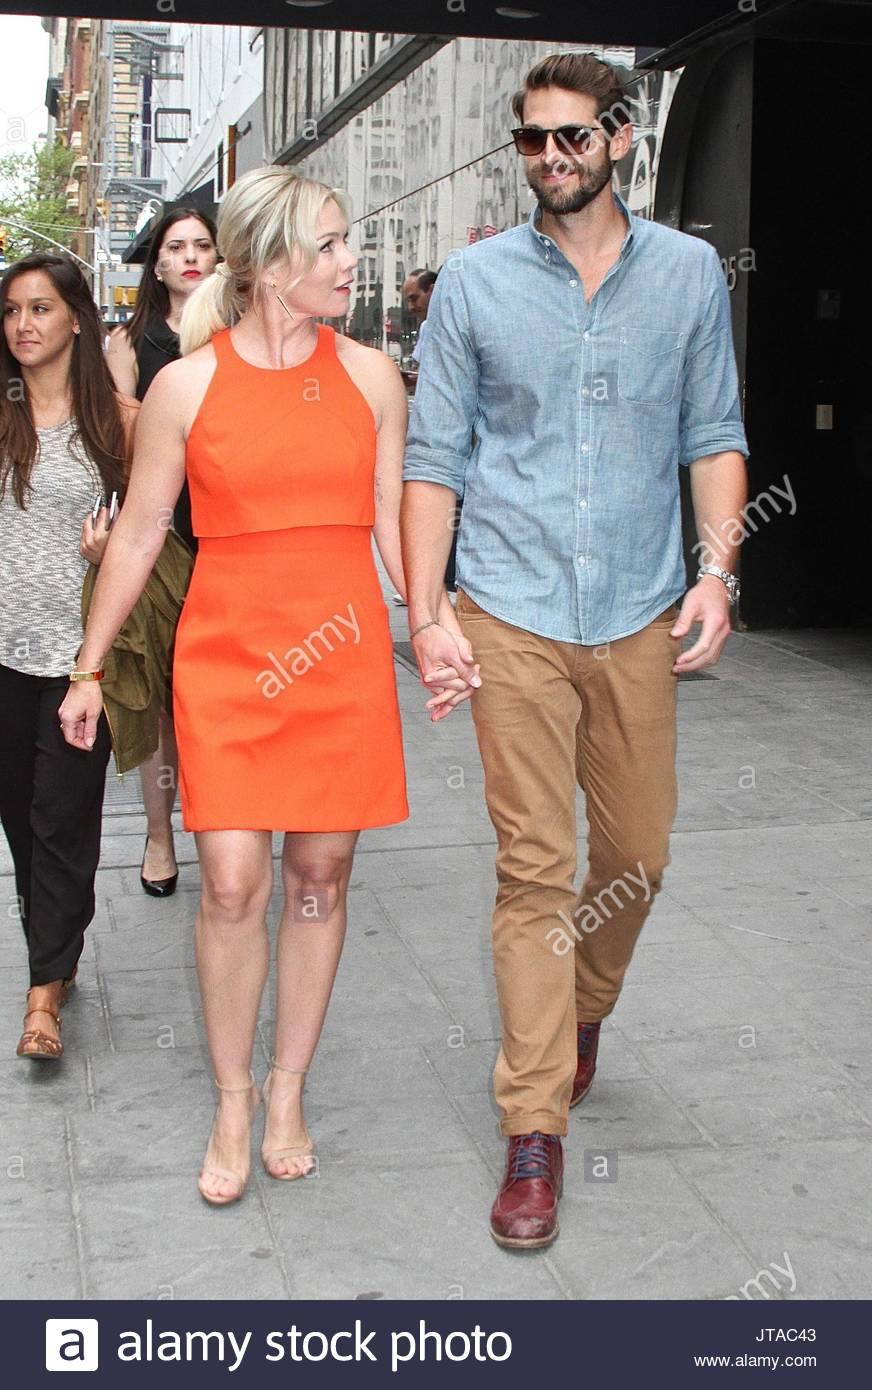 Zachary Quinto Boyfriend Chris Pine David Abrams Stock Pho...